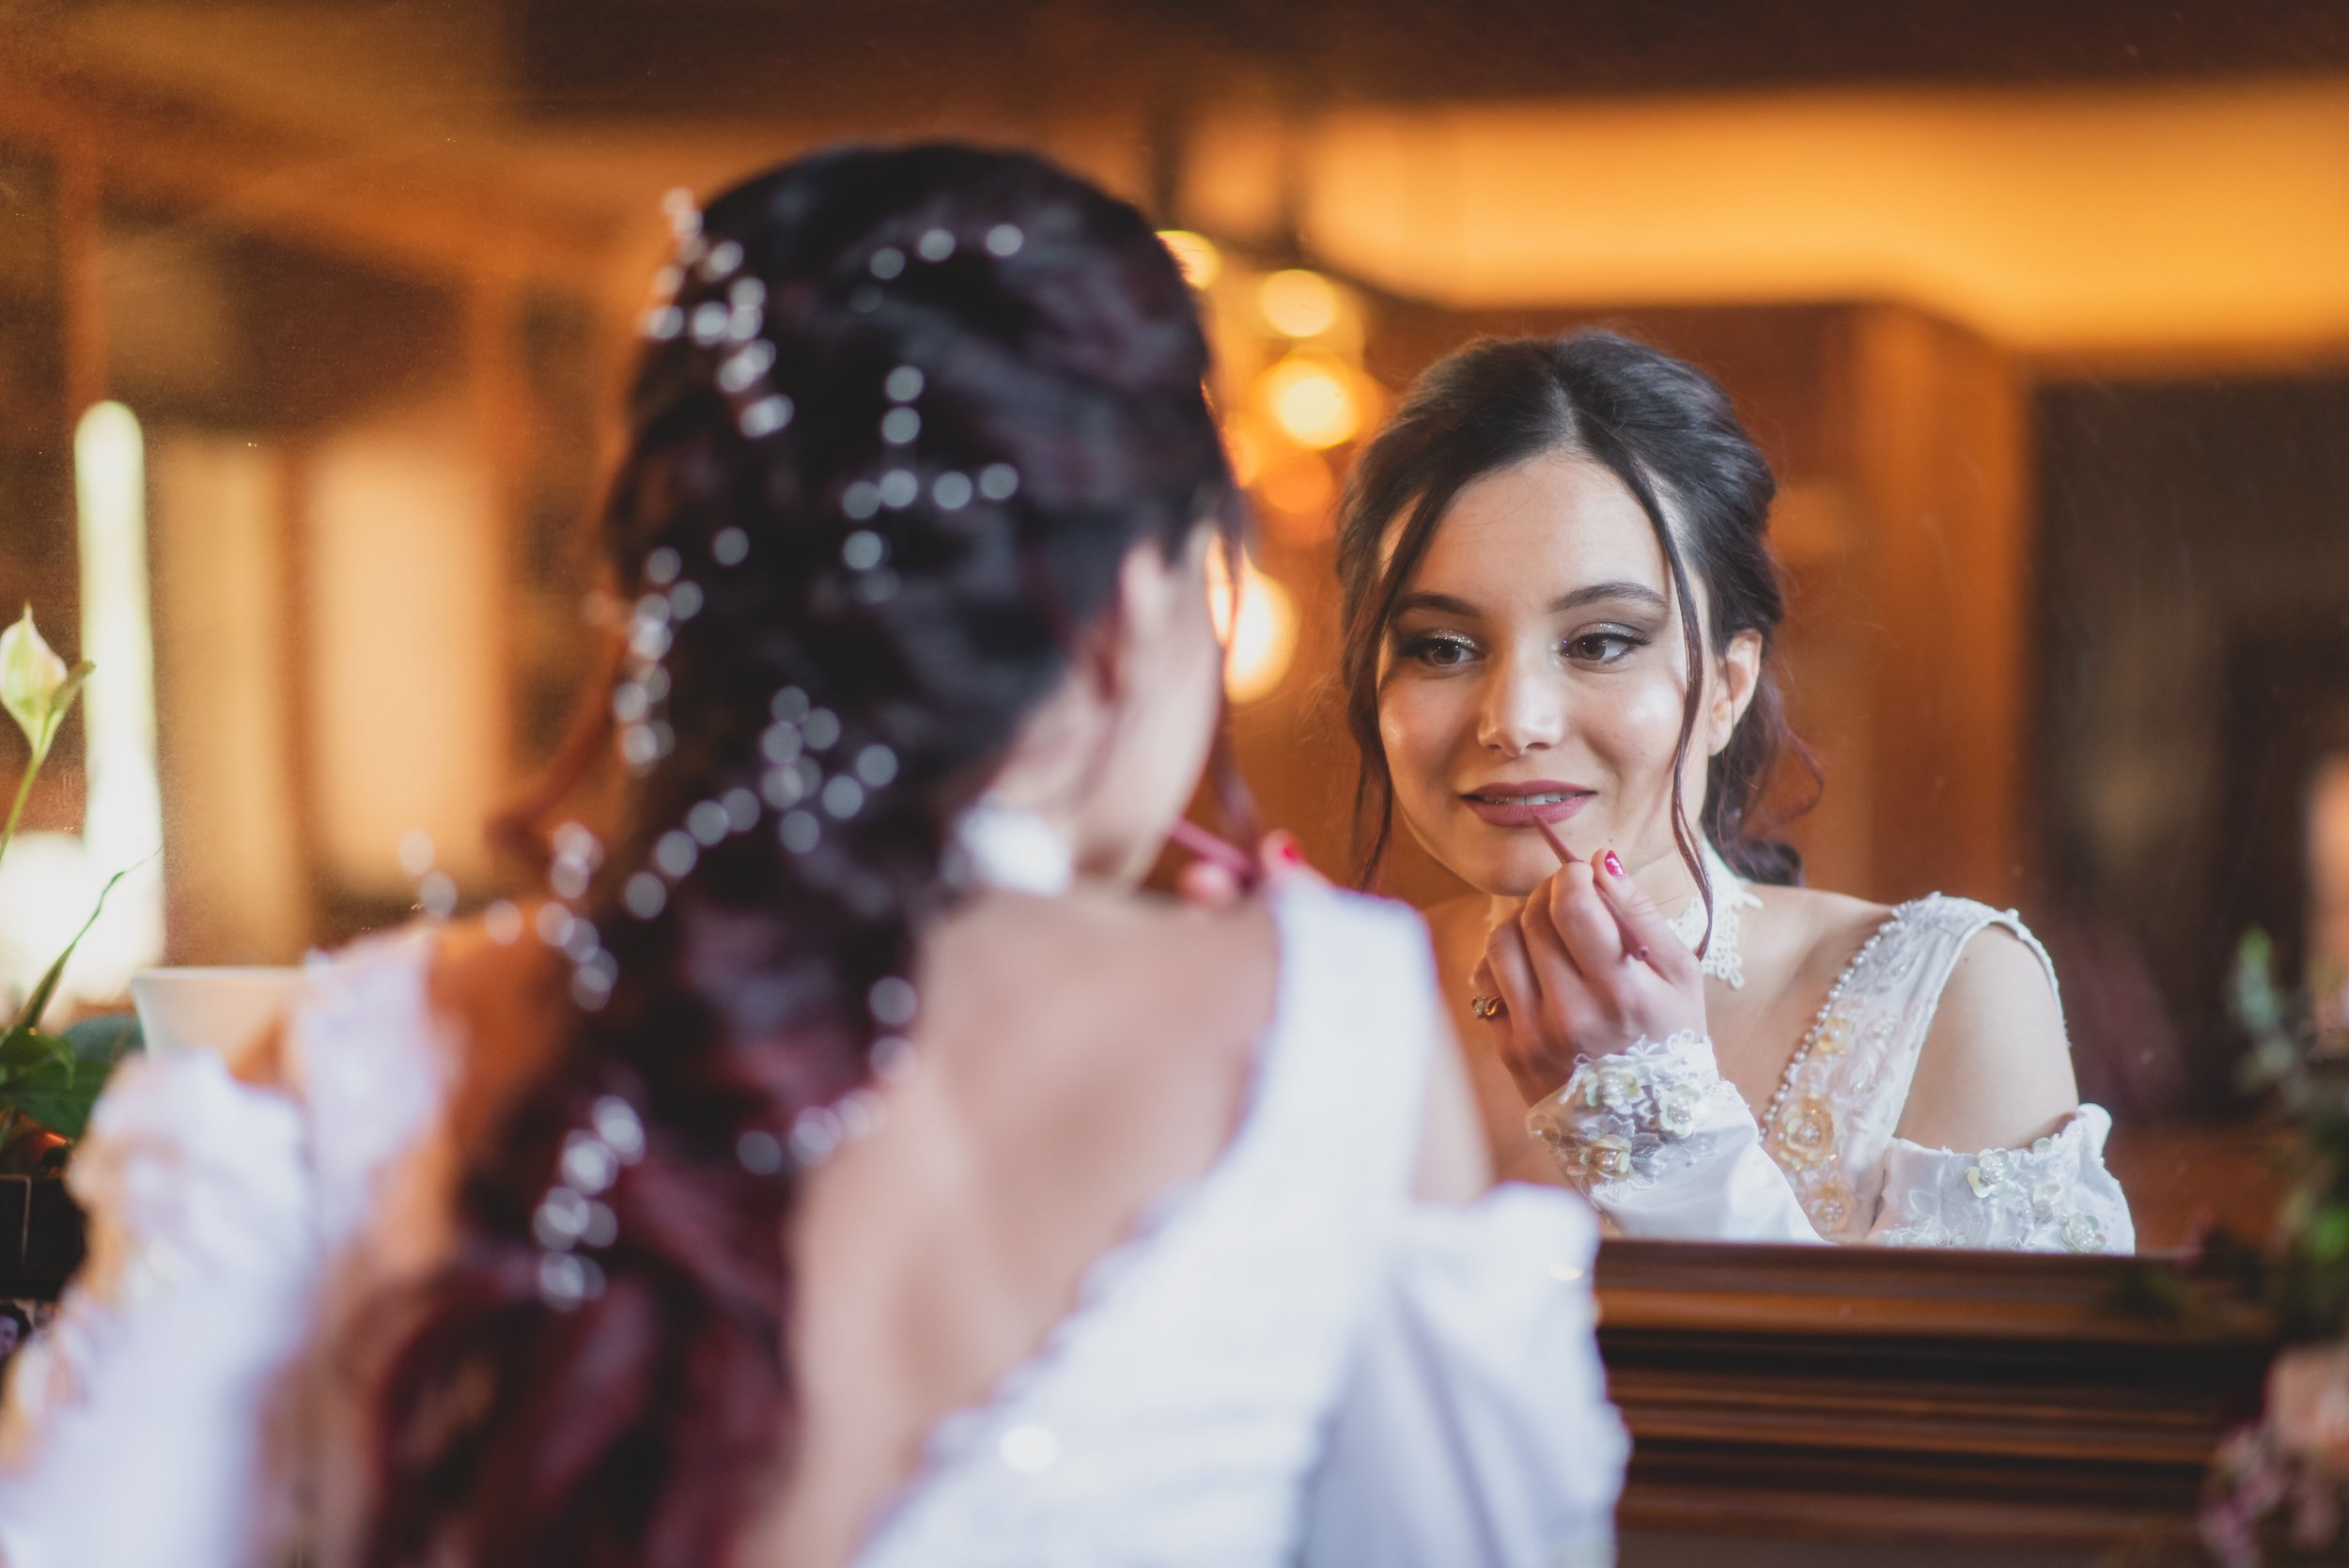 Wedding Photography - Wedding Survival Kit - Bride Getting Ready